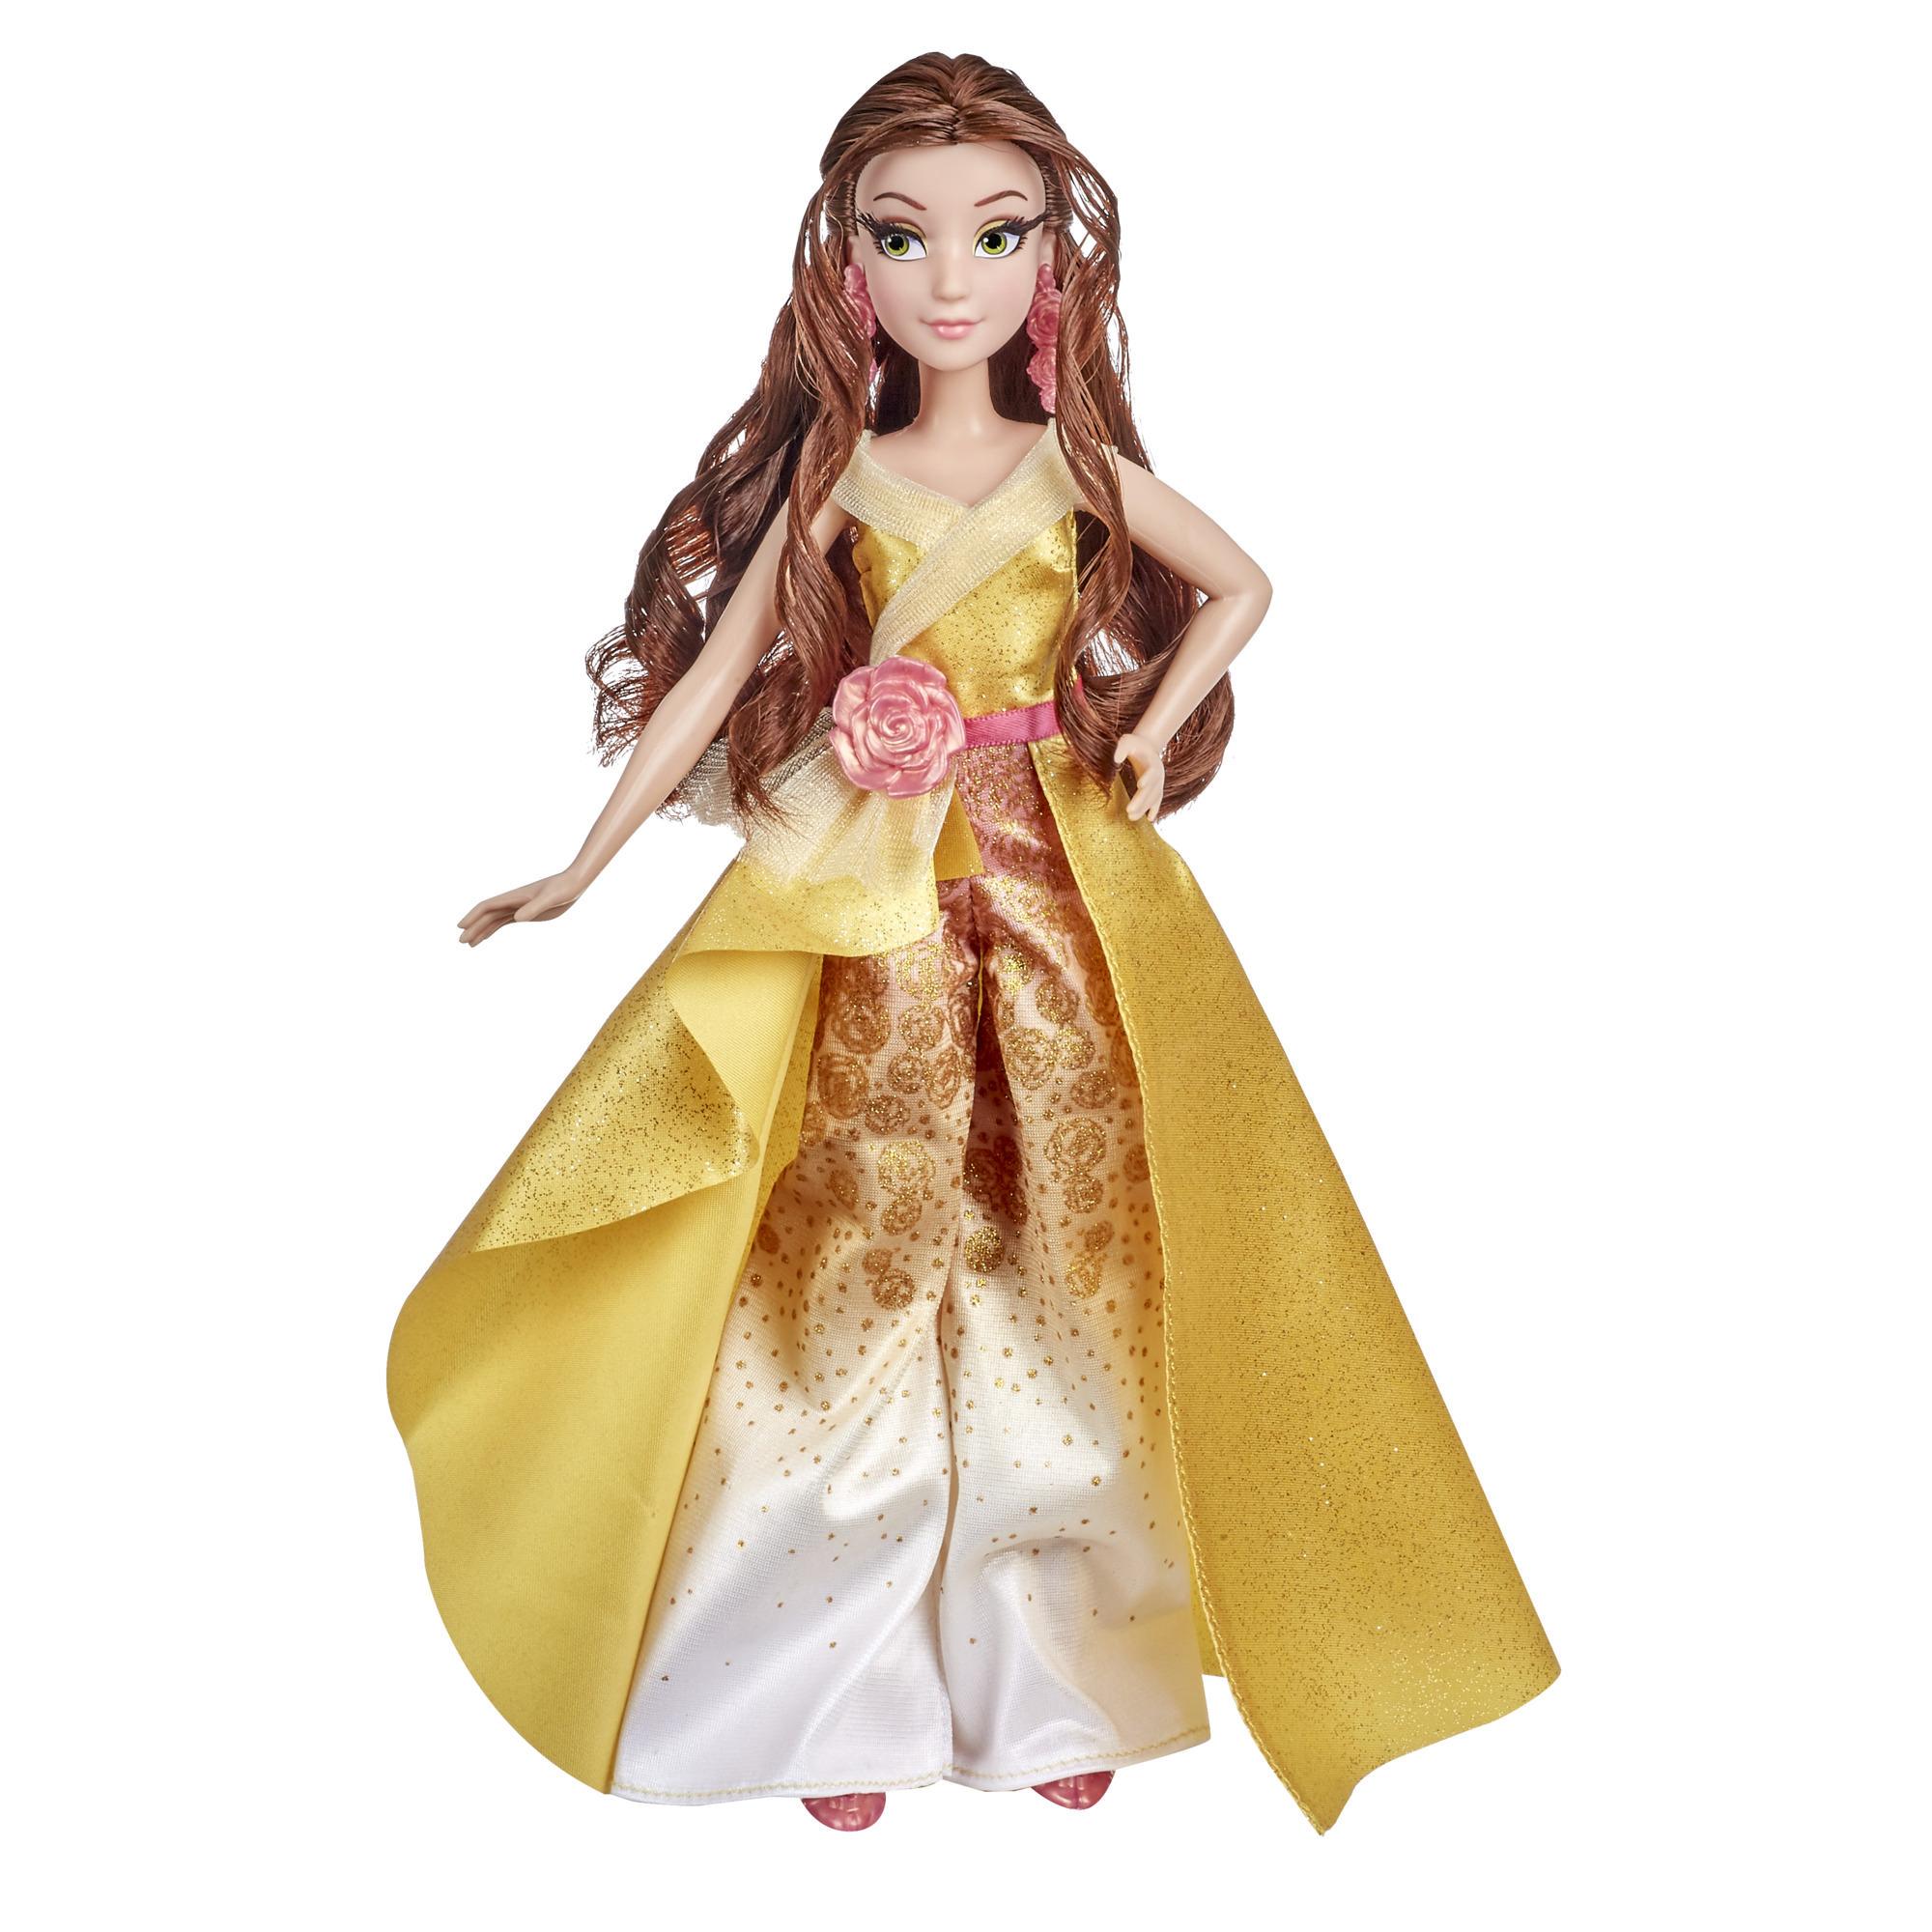 Disney Princesses Style Series, Belle